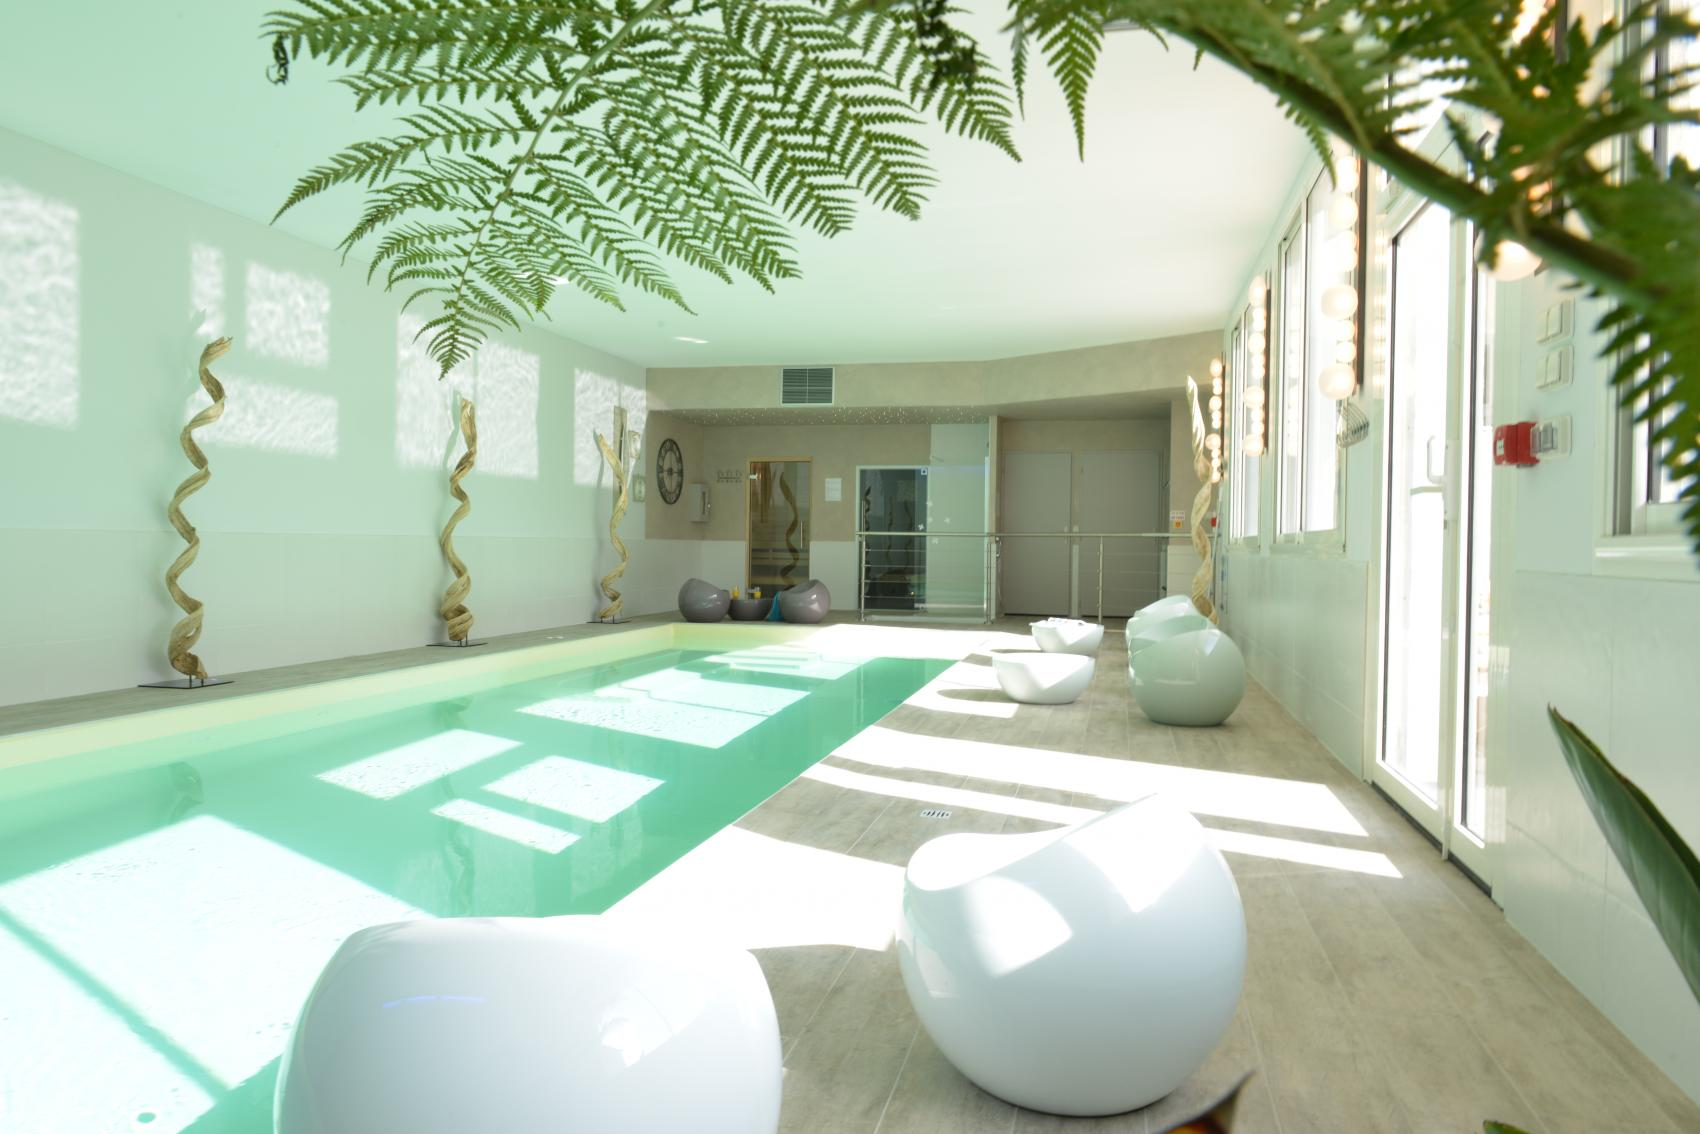 Meilleurs tarifs garantis grand h tel des bains et for Fouras hotel